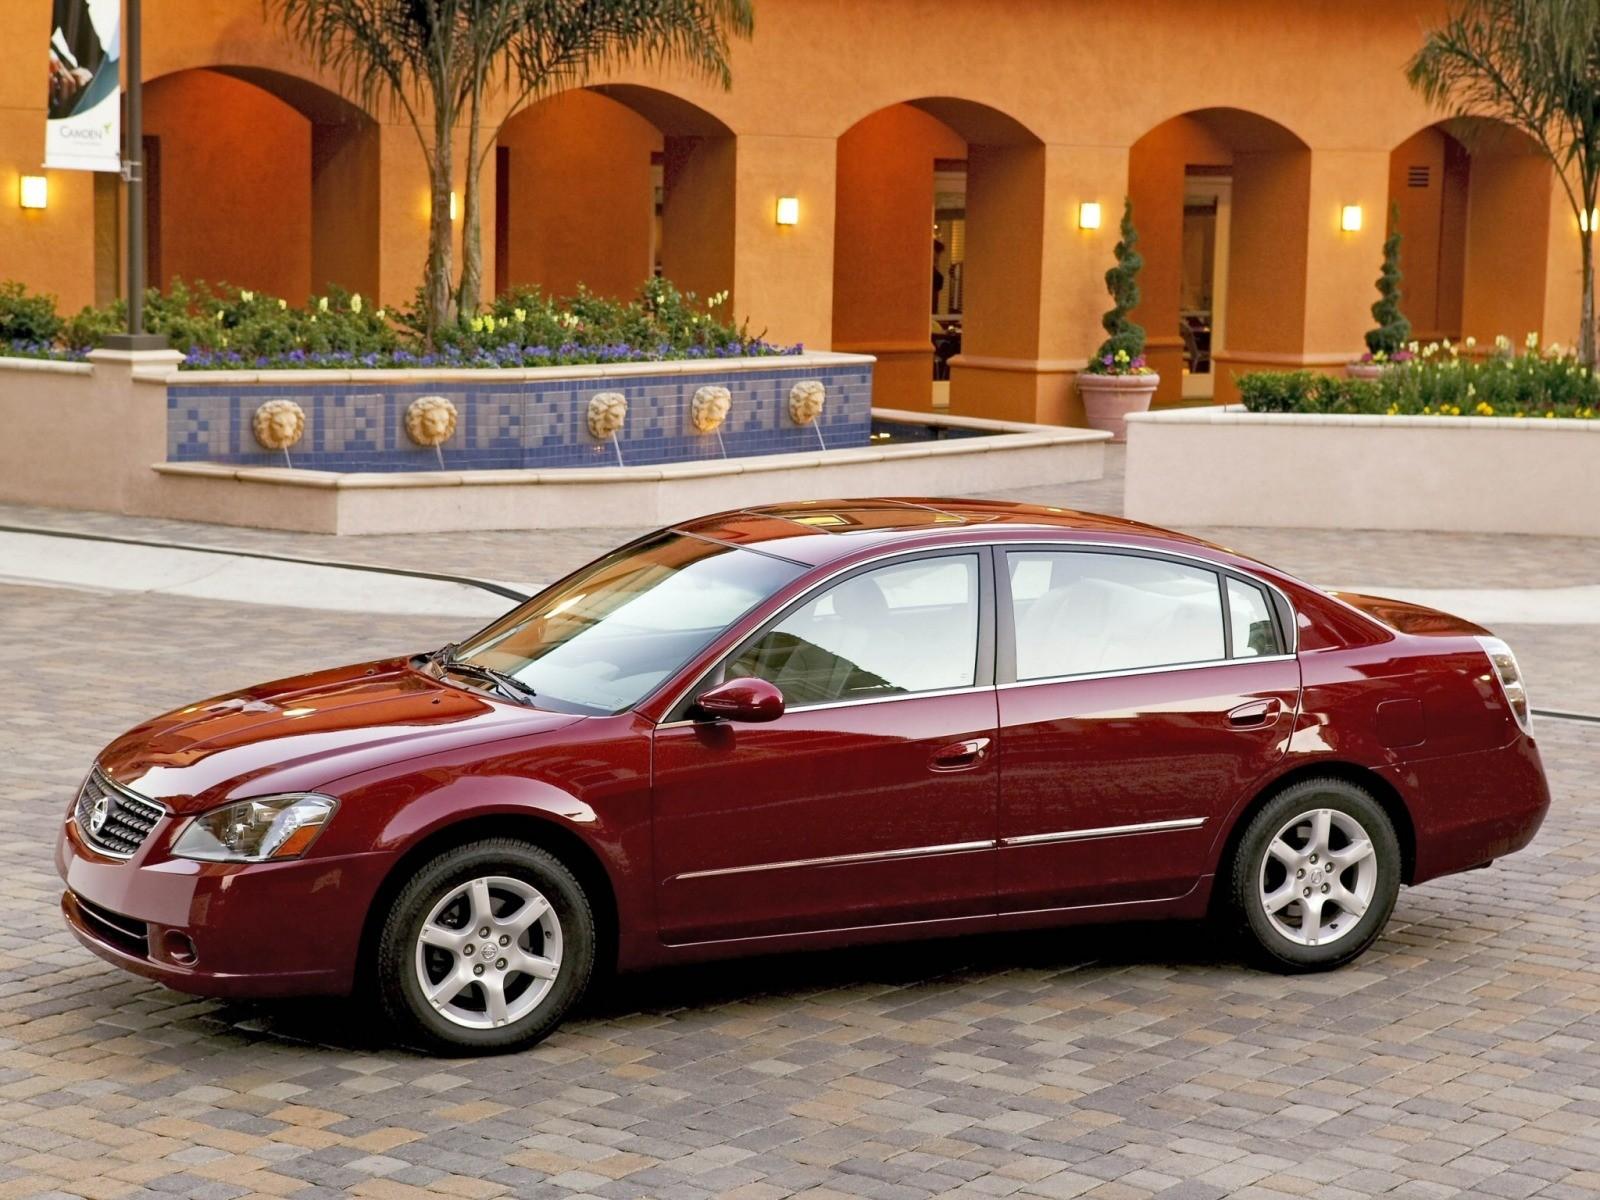 altima nissan 2002 2005 2006 se sedan restyling l31 doors cars autoevolution 1600 2004 front specs 2003 1200